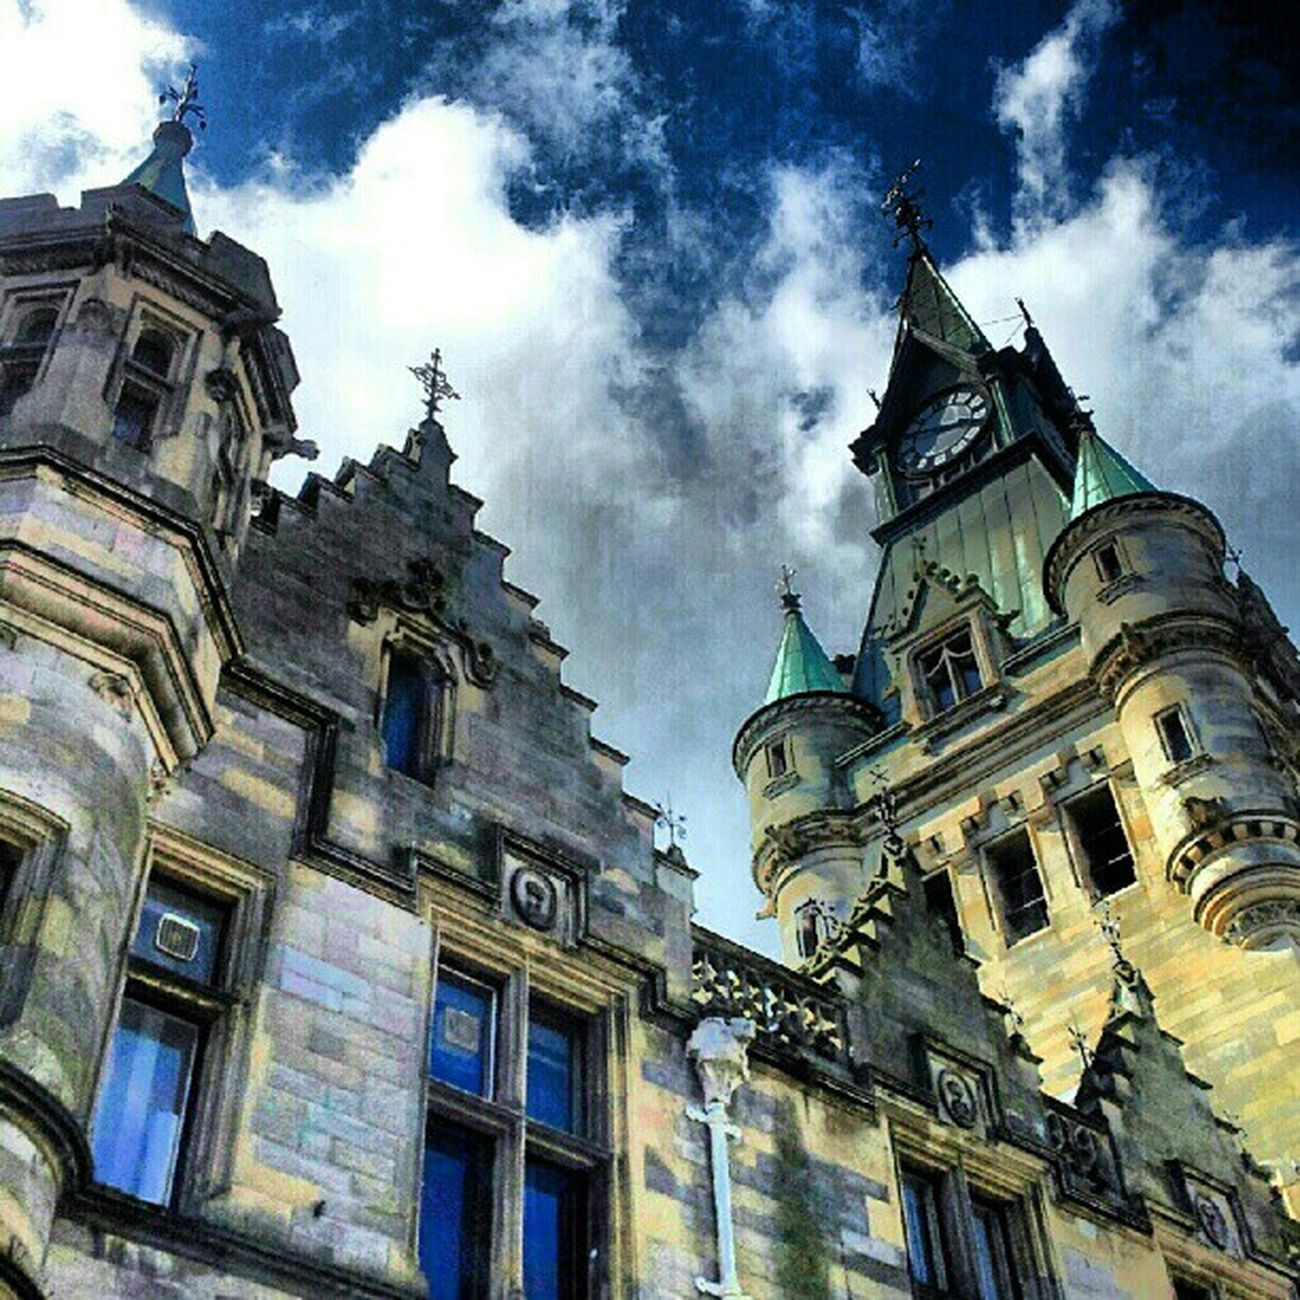 'The Registry' Dunfermline Fife  Scotland Igscotland haggismunchers Gothic Registry Architecture Buildings Turrets Stone Cloudporn skyporn skypainters instamob instahub picoftheday bestoftheday primeshots